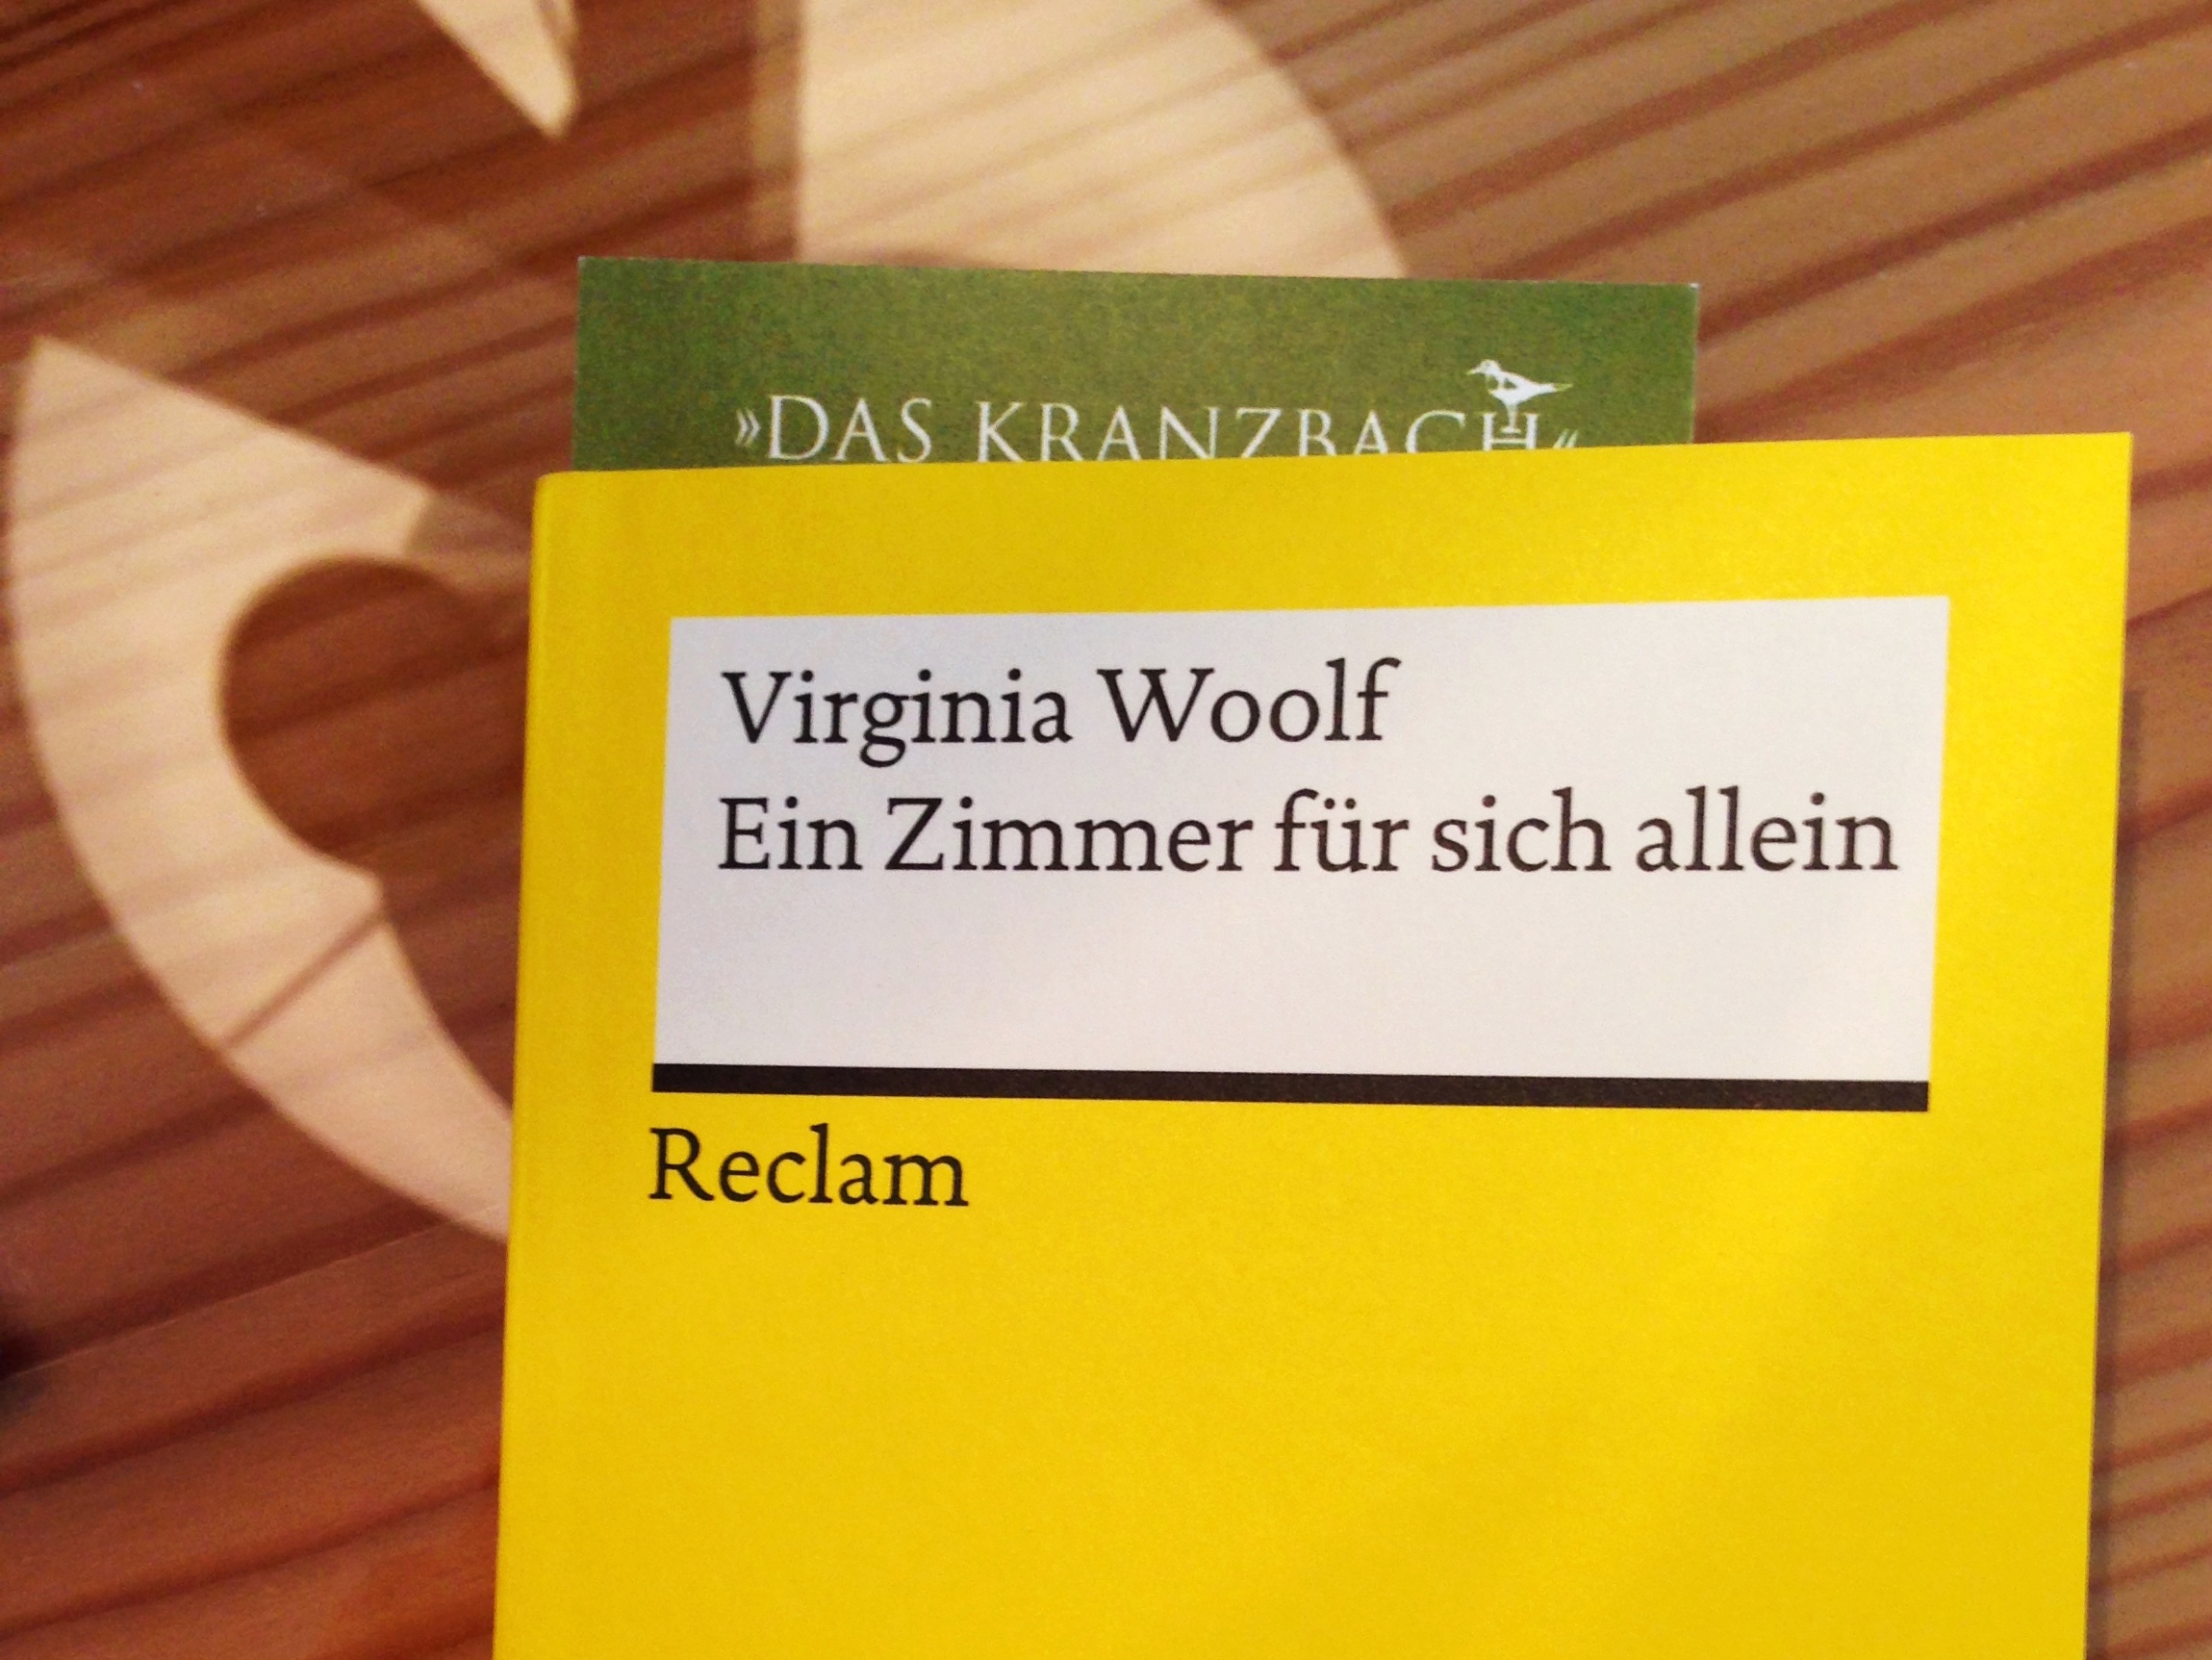 Kranzbach - Book